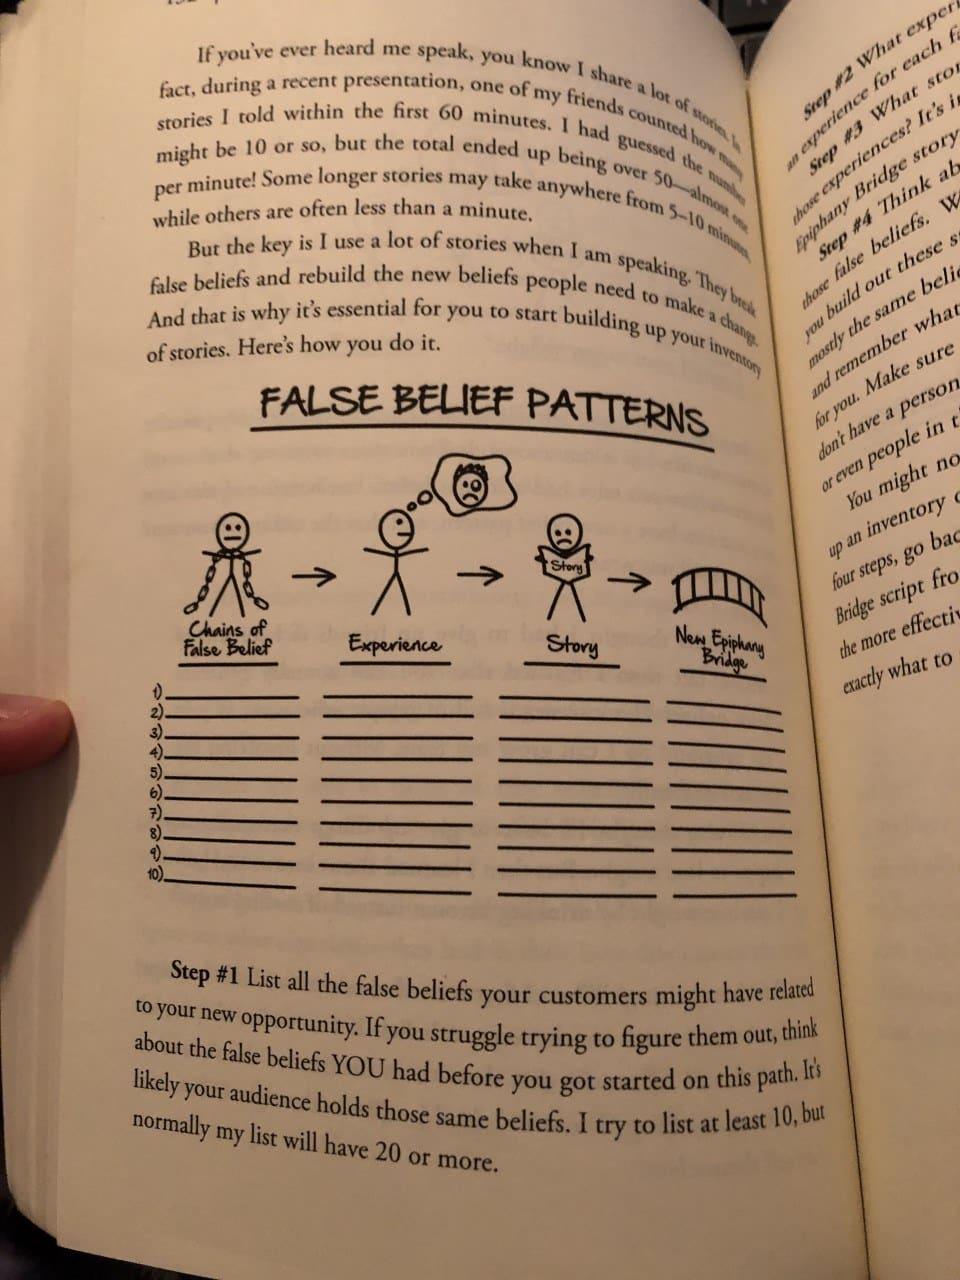 expert secrets breaking false belief patters